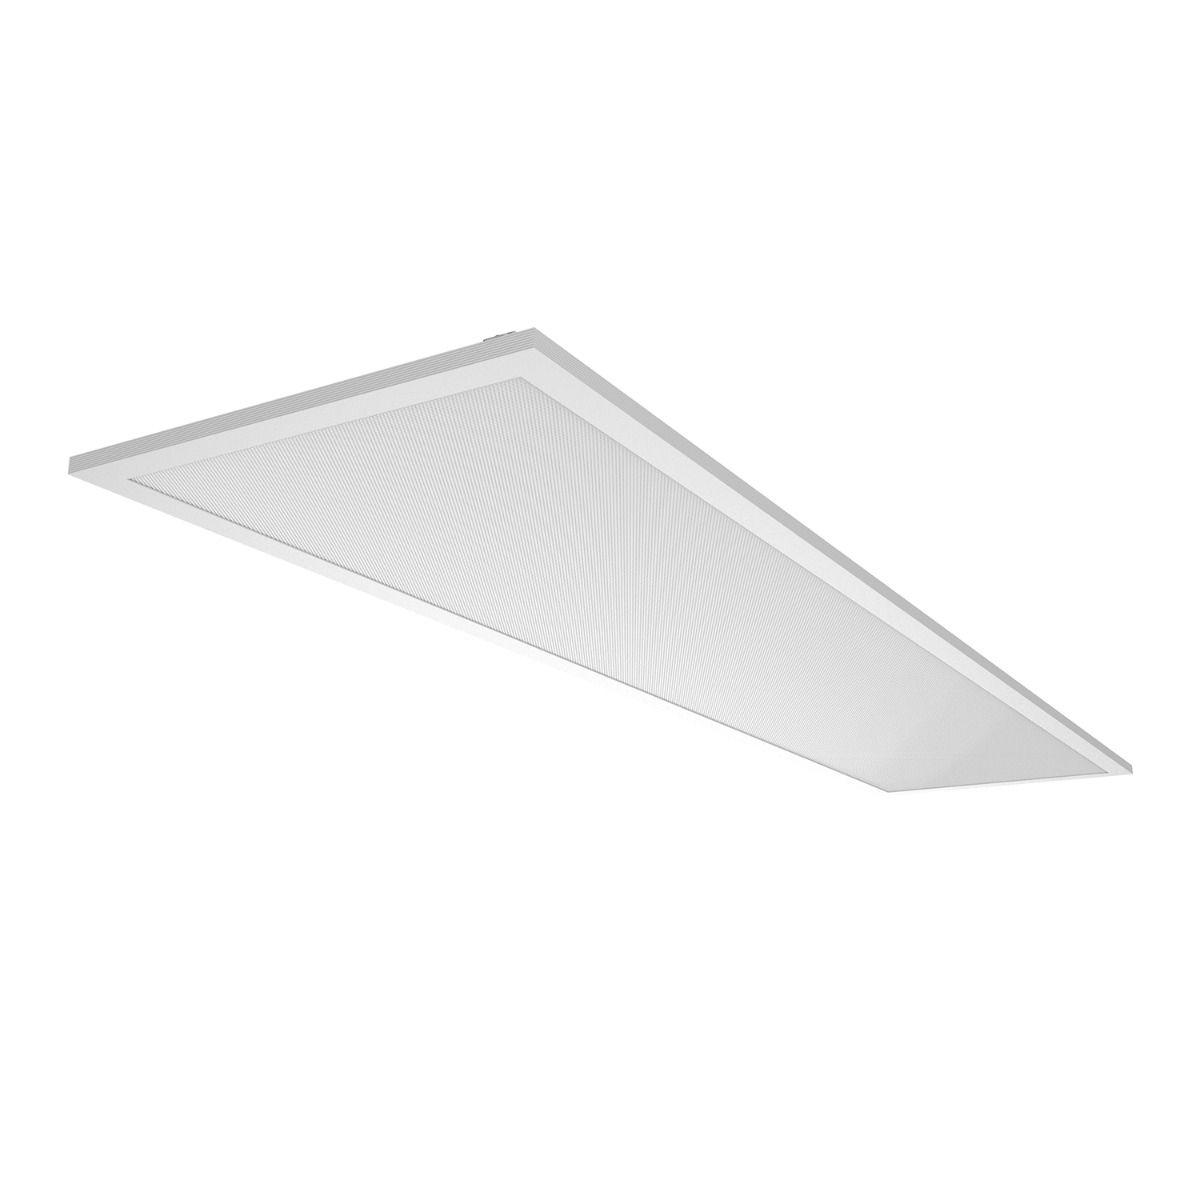 Noxion LED Panel Delta Pro V3 30W 3000K 3960lm 30x120cm UGR <19 | Warmweiß - Ersatz für 2x36W